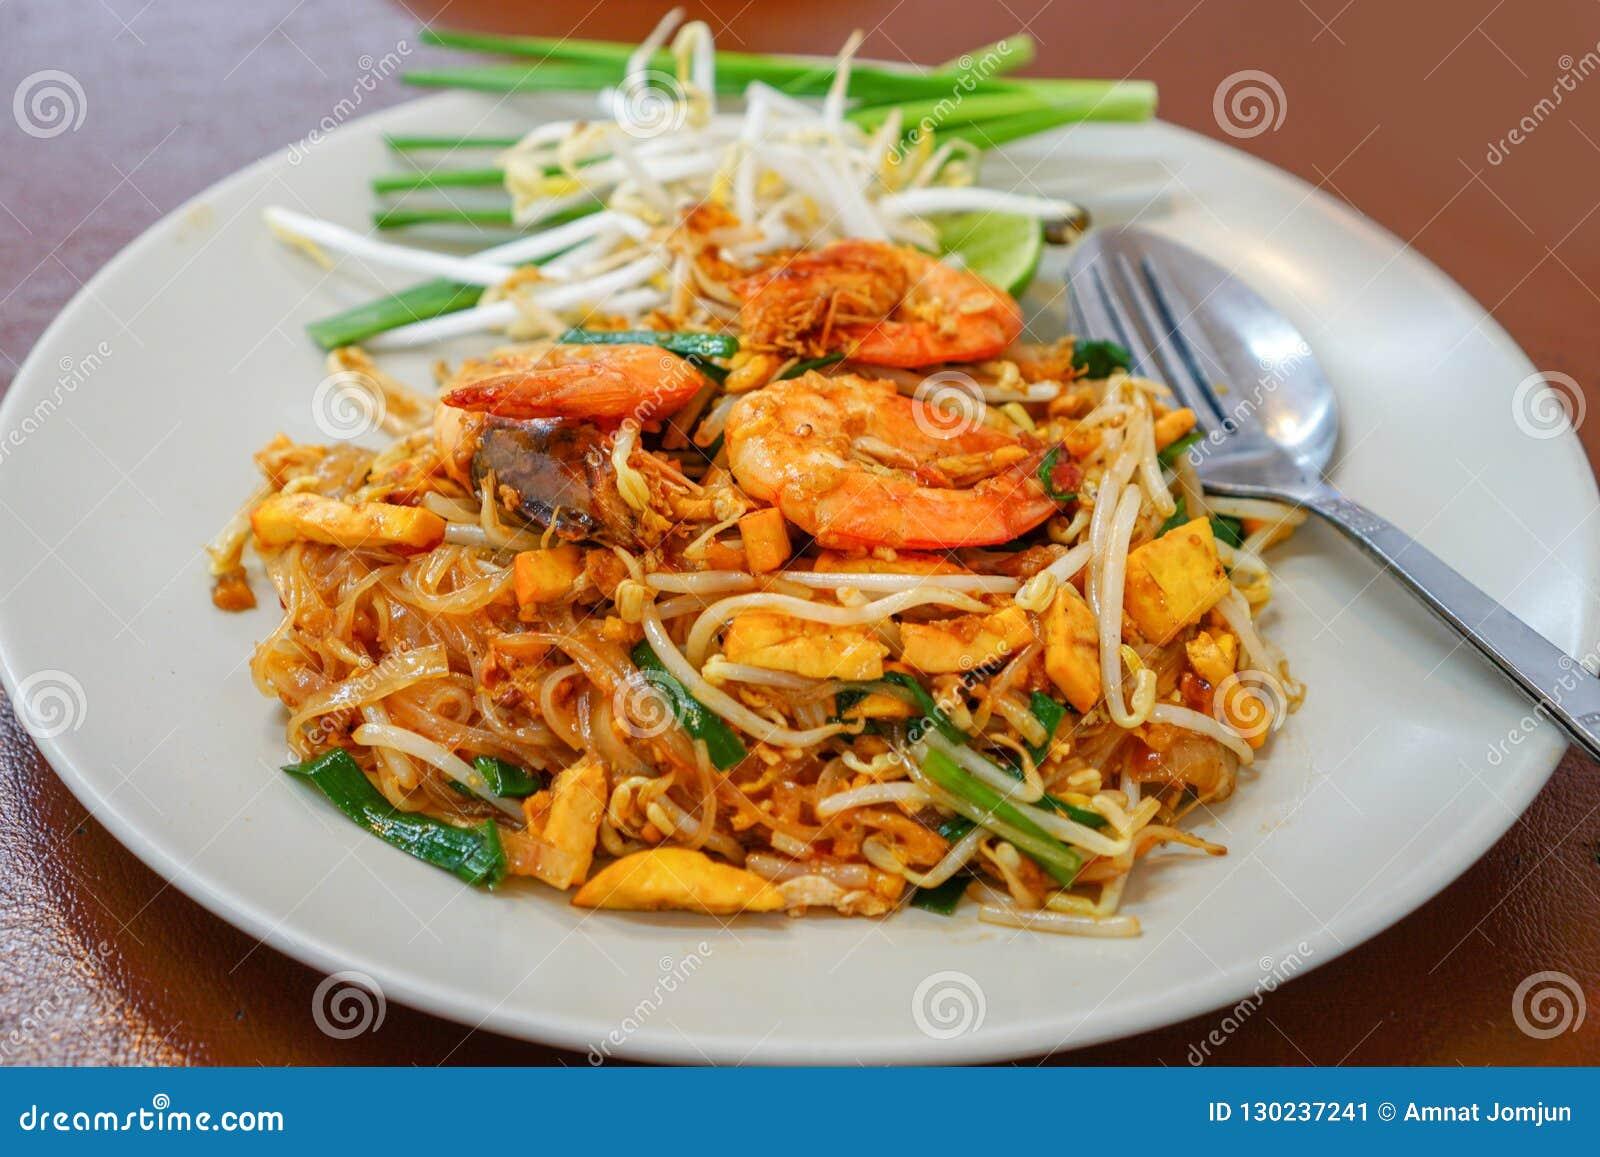 Rellene el césped tailandés de Goong en una placa blanca